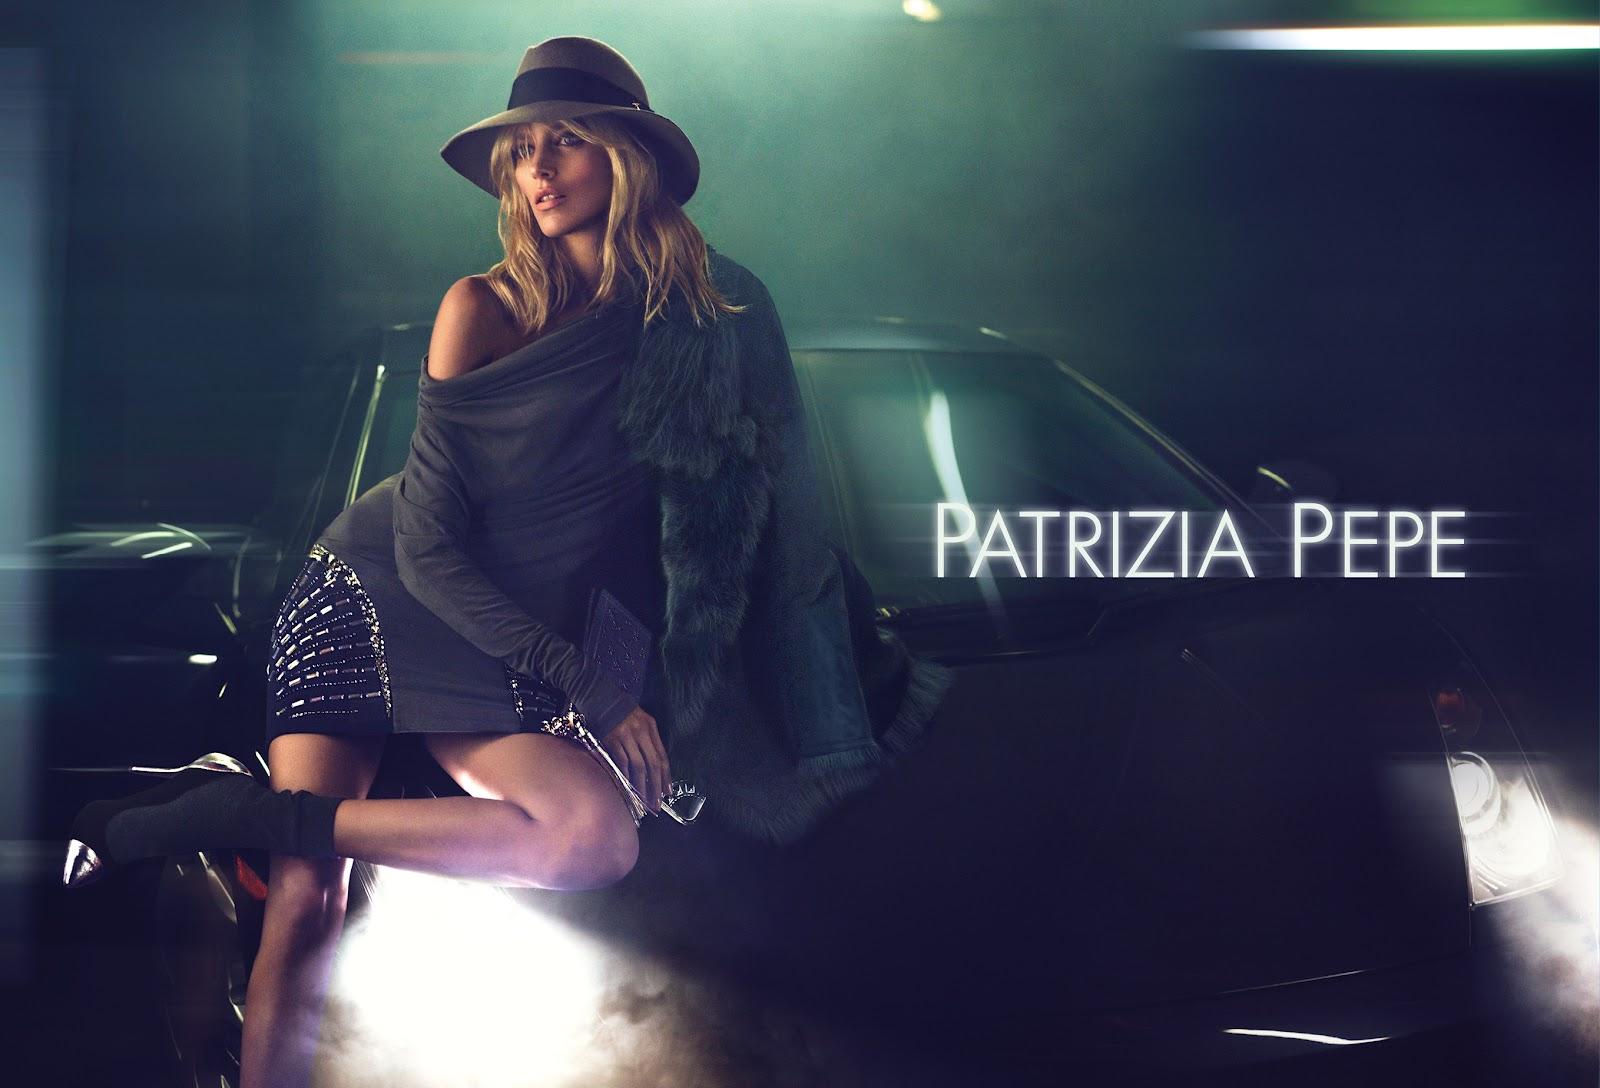 http://3.bp.blogspot.com/-qssCFV-0ZoY/UEDFxCDL6GI/AAAAAAAABxA/r2XeQXzES_g/s1600/Patrizia+Pepe_FW12-13+Advertising+Campaign_4.jpg